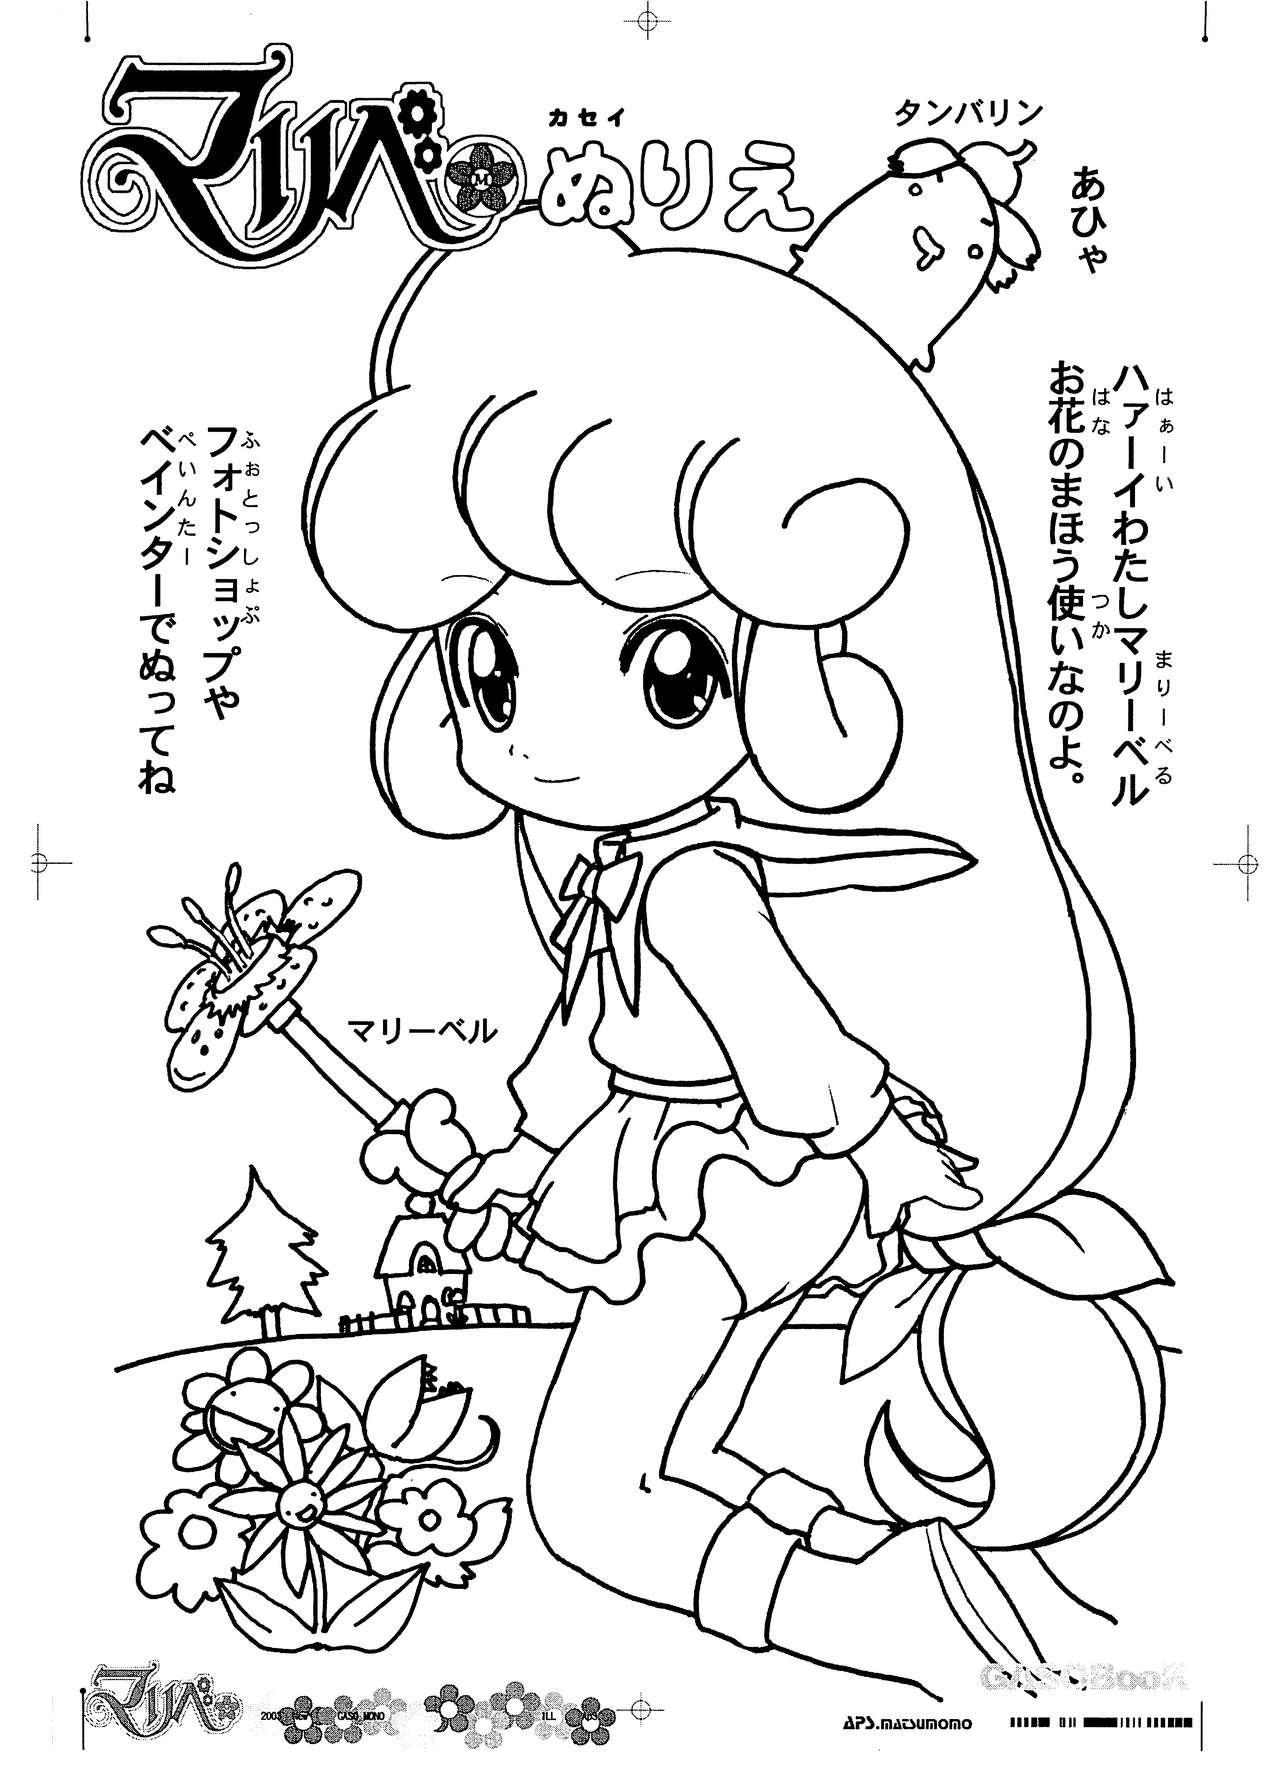 GASOBooK Genkou Youshi Ring3 Alt-0312 3